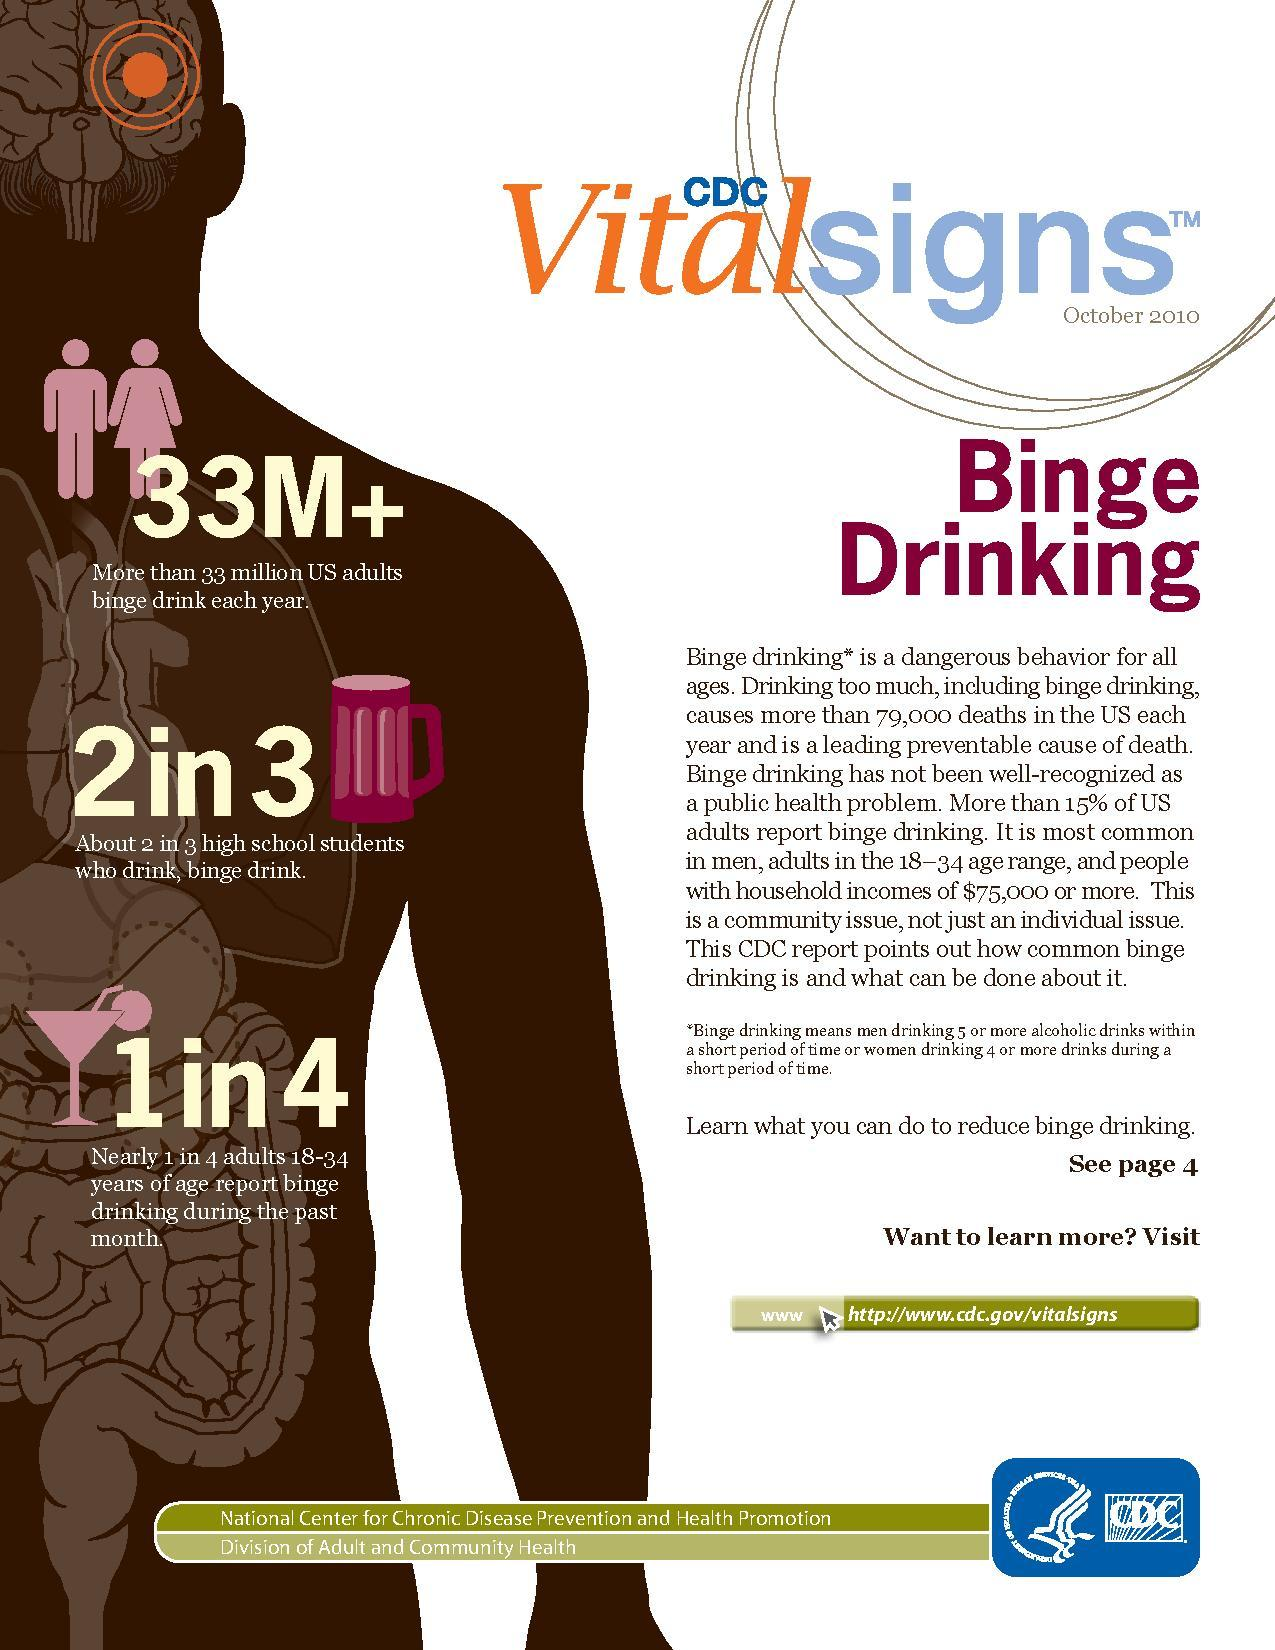 File:Binge Drinking-CDC Vital Signs-October 2010.pdf - Wikimedia Commons